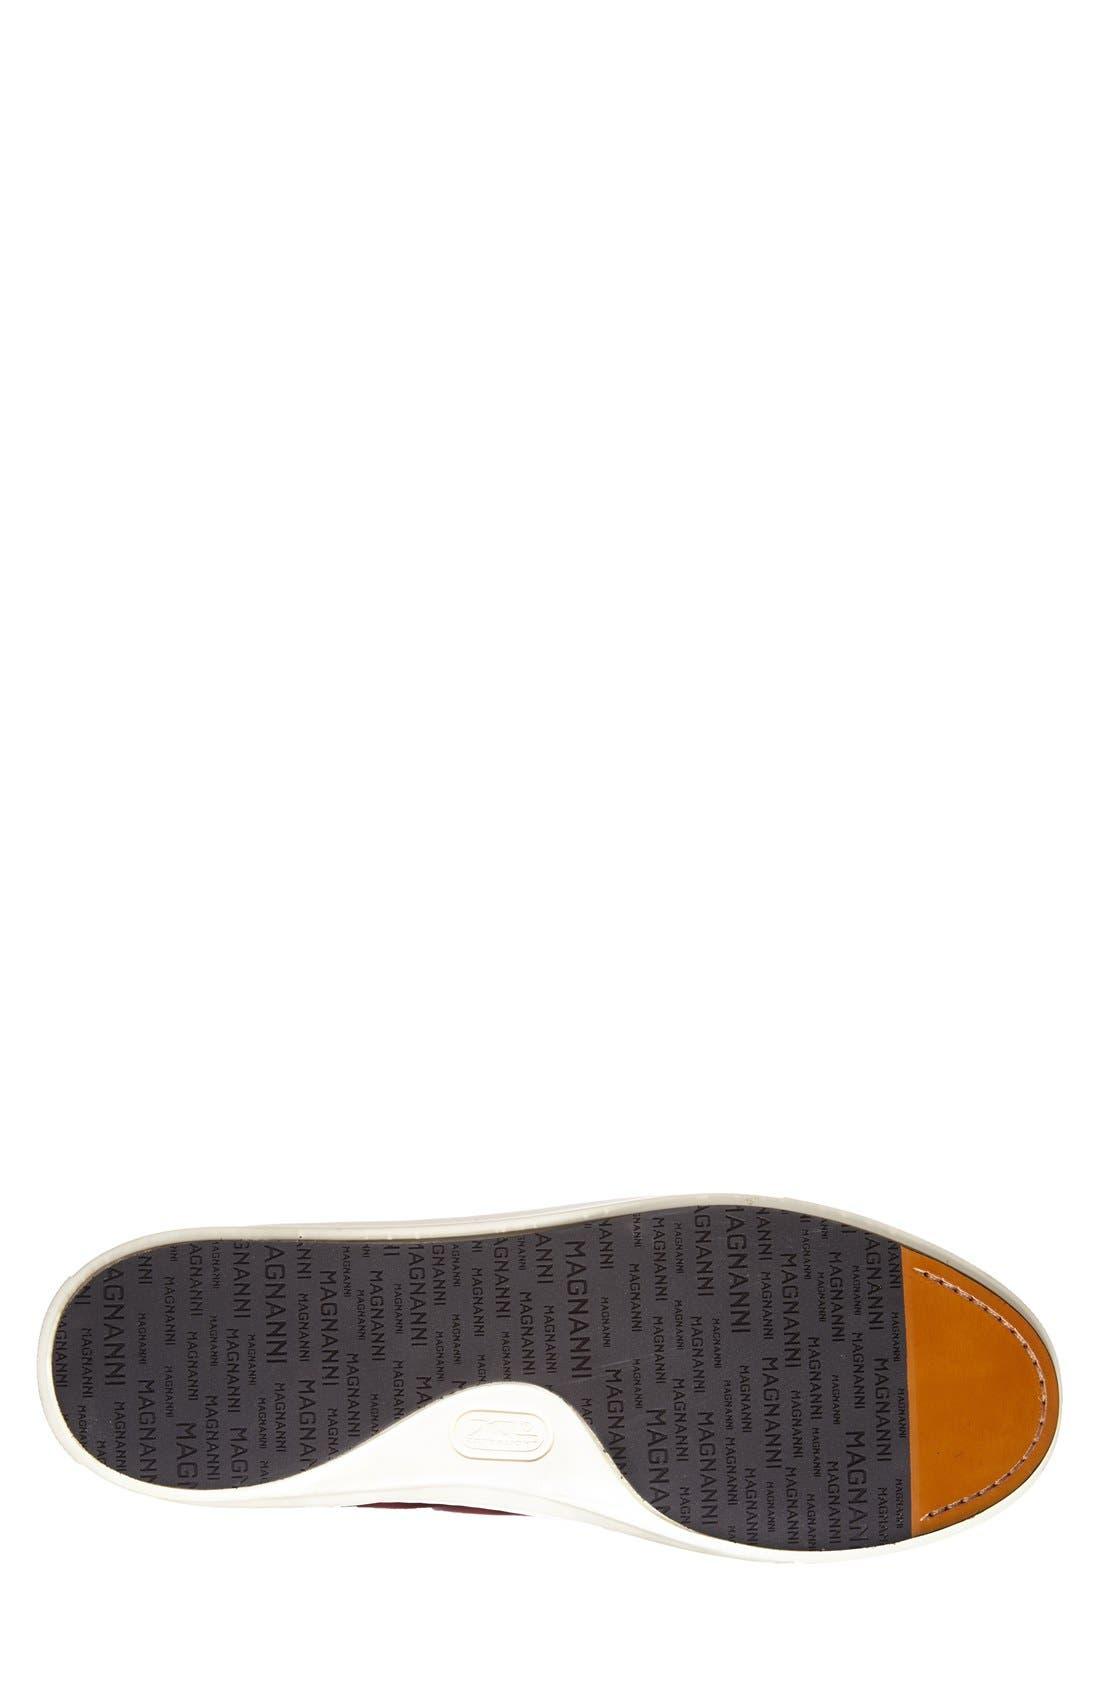 Brando High Top Sneaker,                             Alternate thumbnail 3, color,                             RED